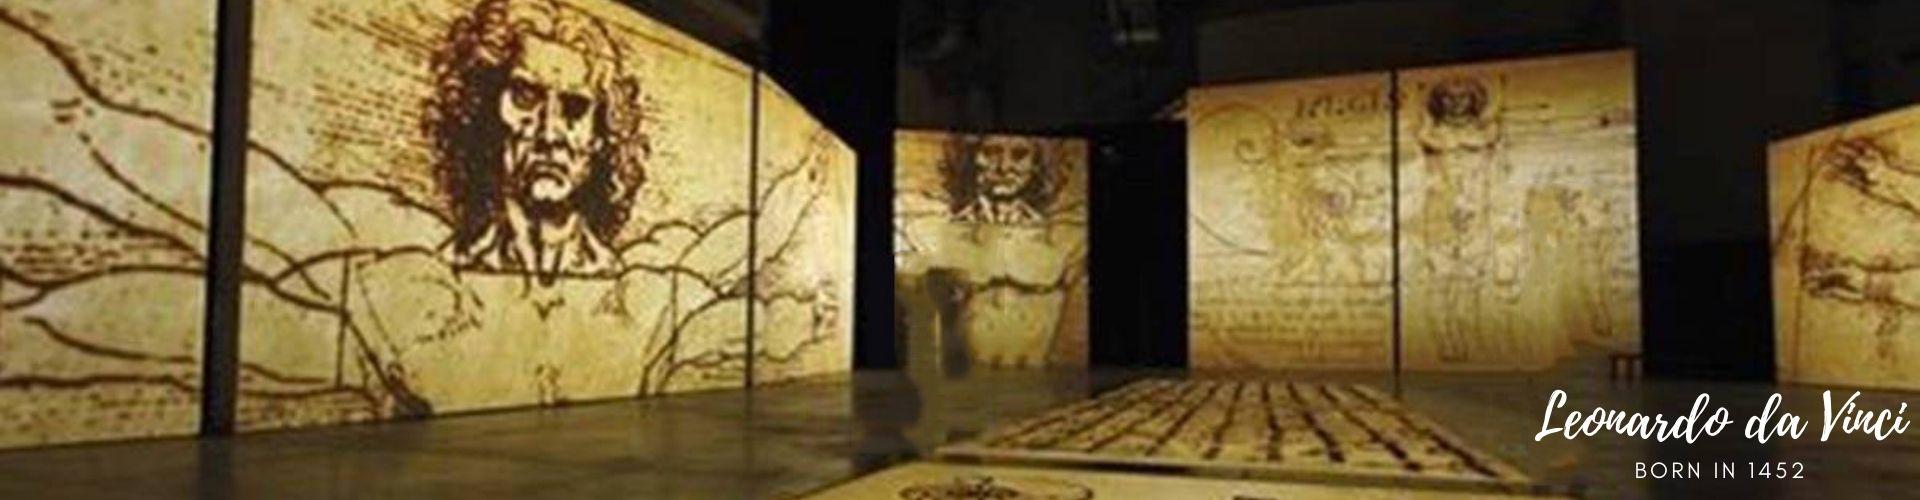 custom Leonardo da Vinci wholesale manufacturer and supplier in China